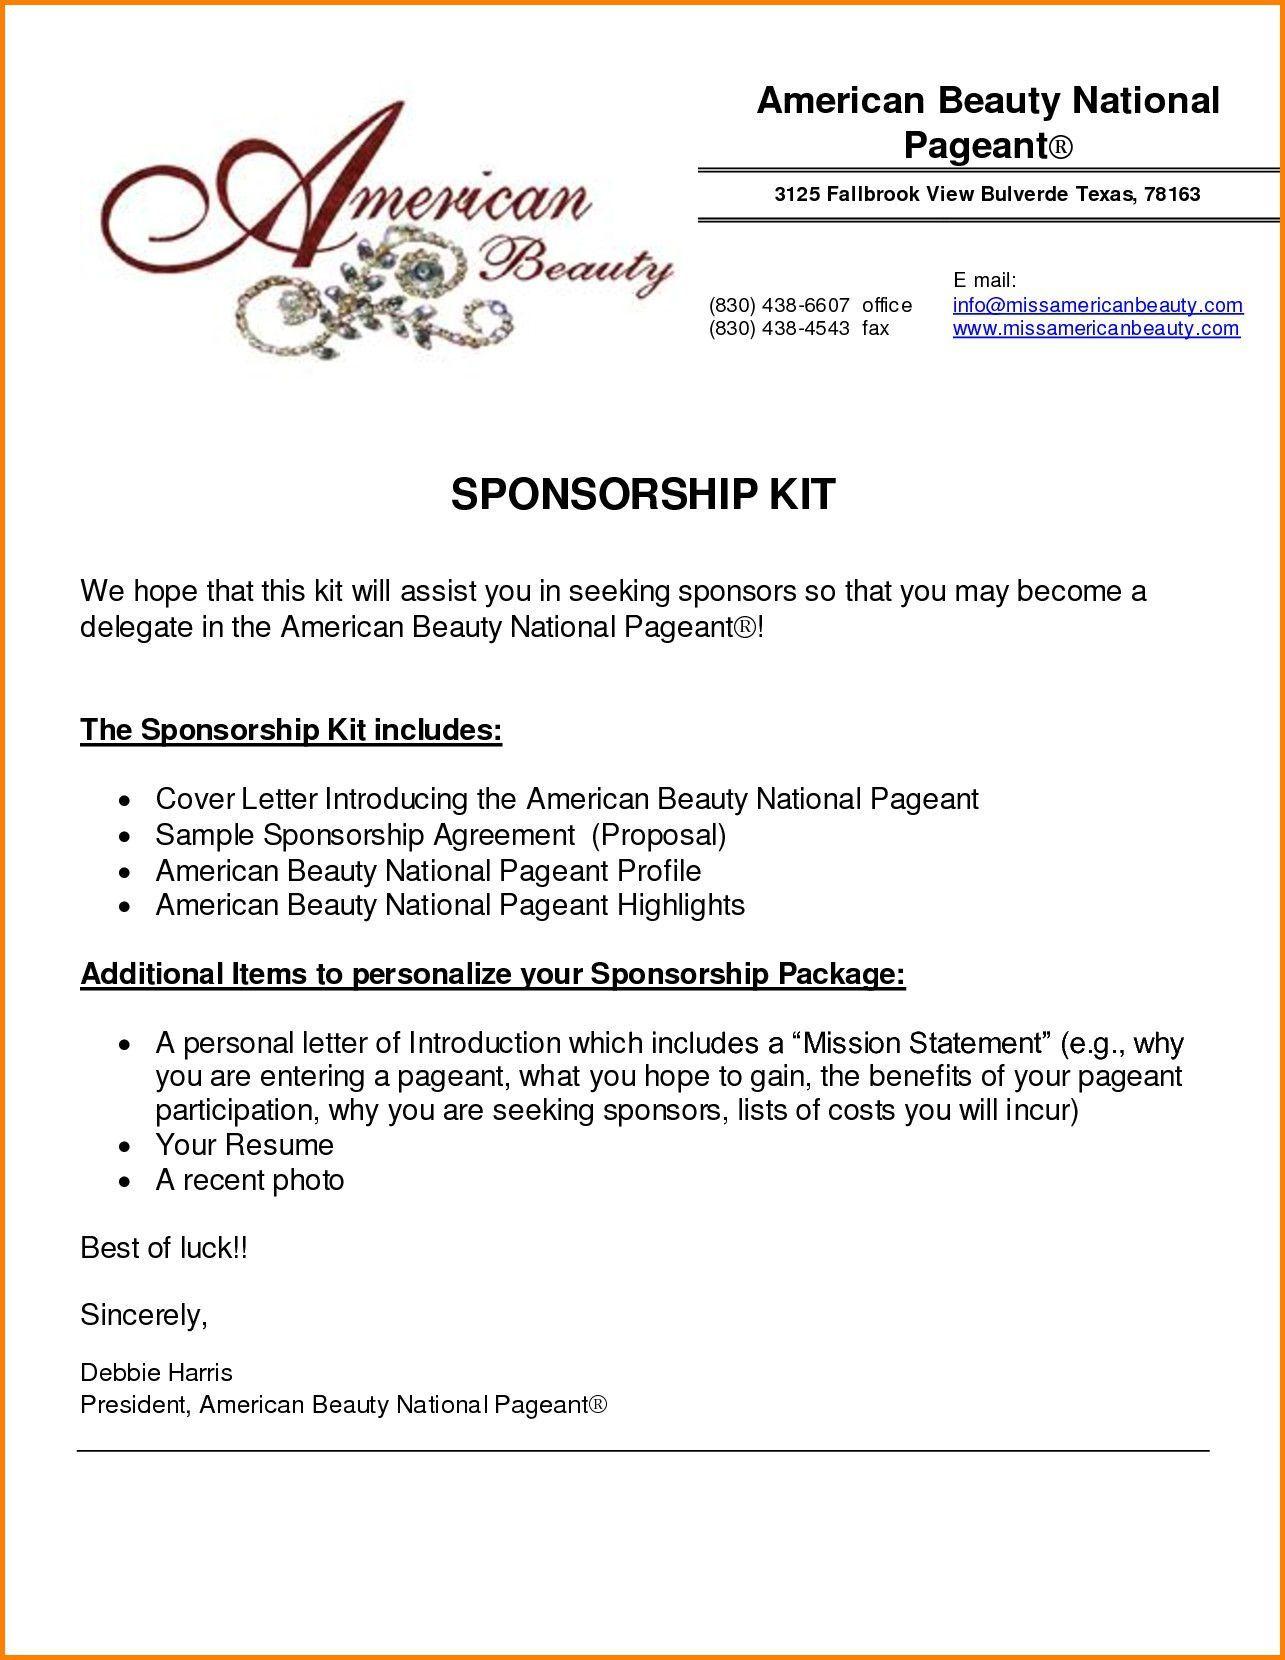 003 Imposing Event Sponsorship Proposal Sample Pdf Image  For Letter Music TemplateFull